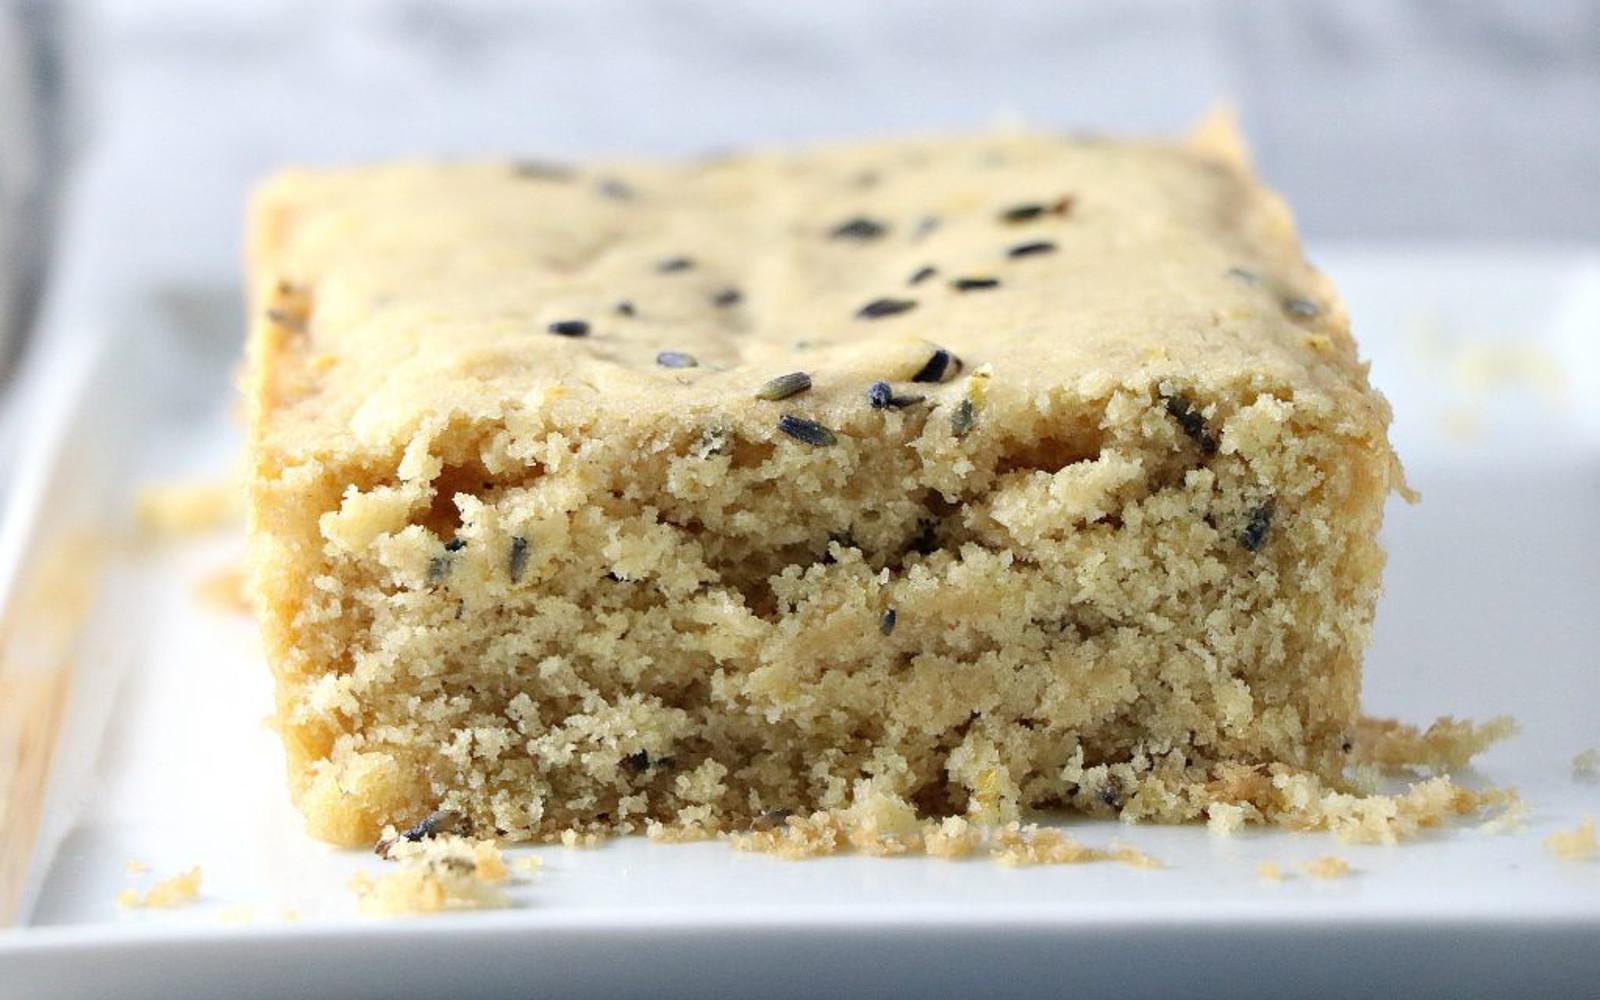 Vegan Lemon Lavender Pound Cake with toppings